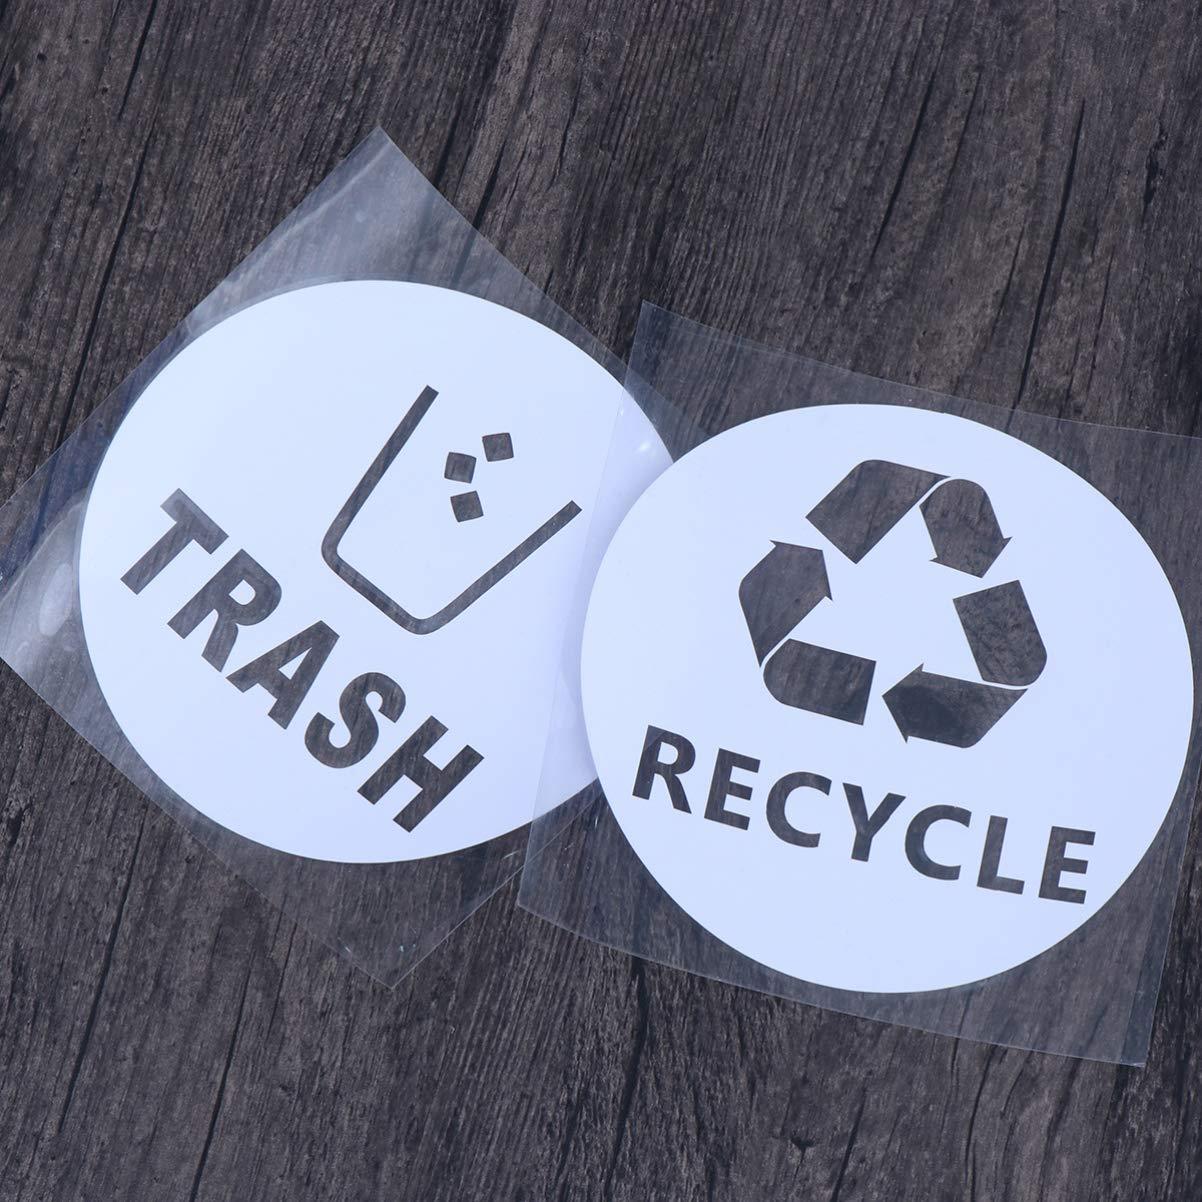 DOITOOL 4pcs recyceln Aufkleber M/ülleimer Abziehbild M/ülleimer Label recyceln Abziehbild Logo f/ür LKW Auto nach Hause K/üche